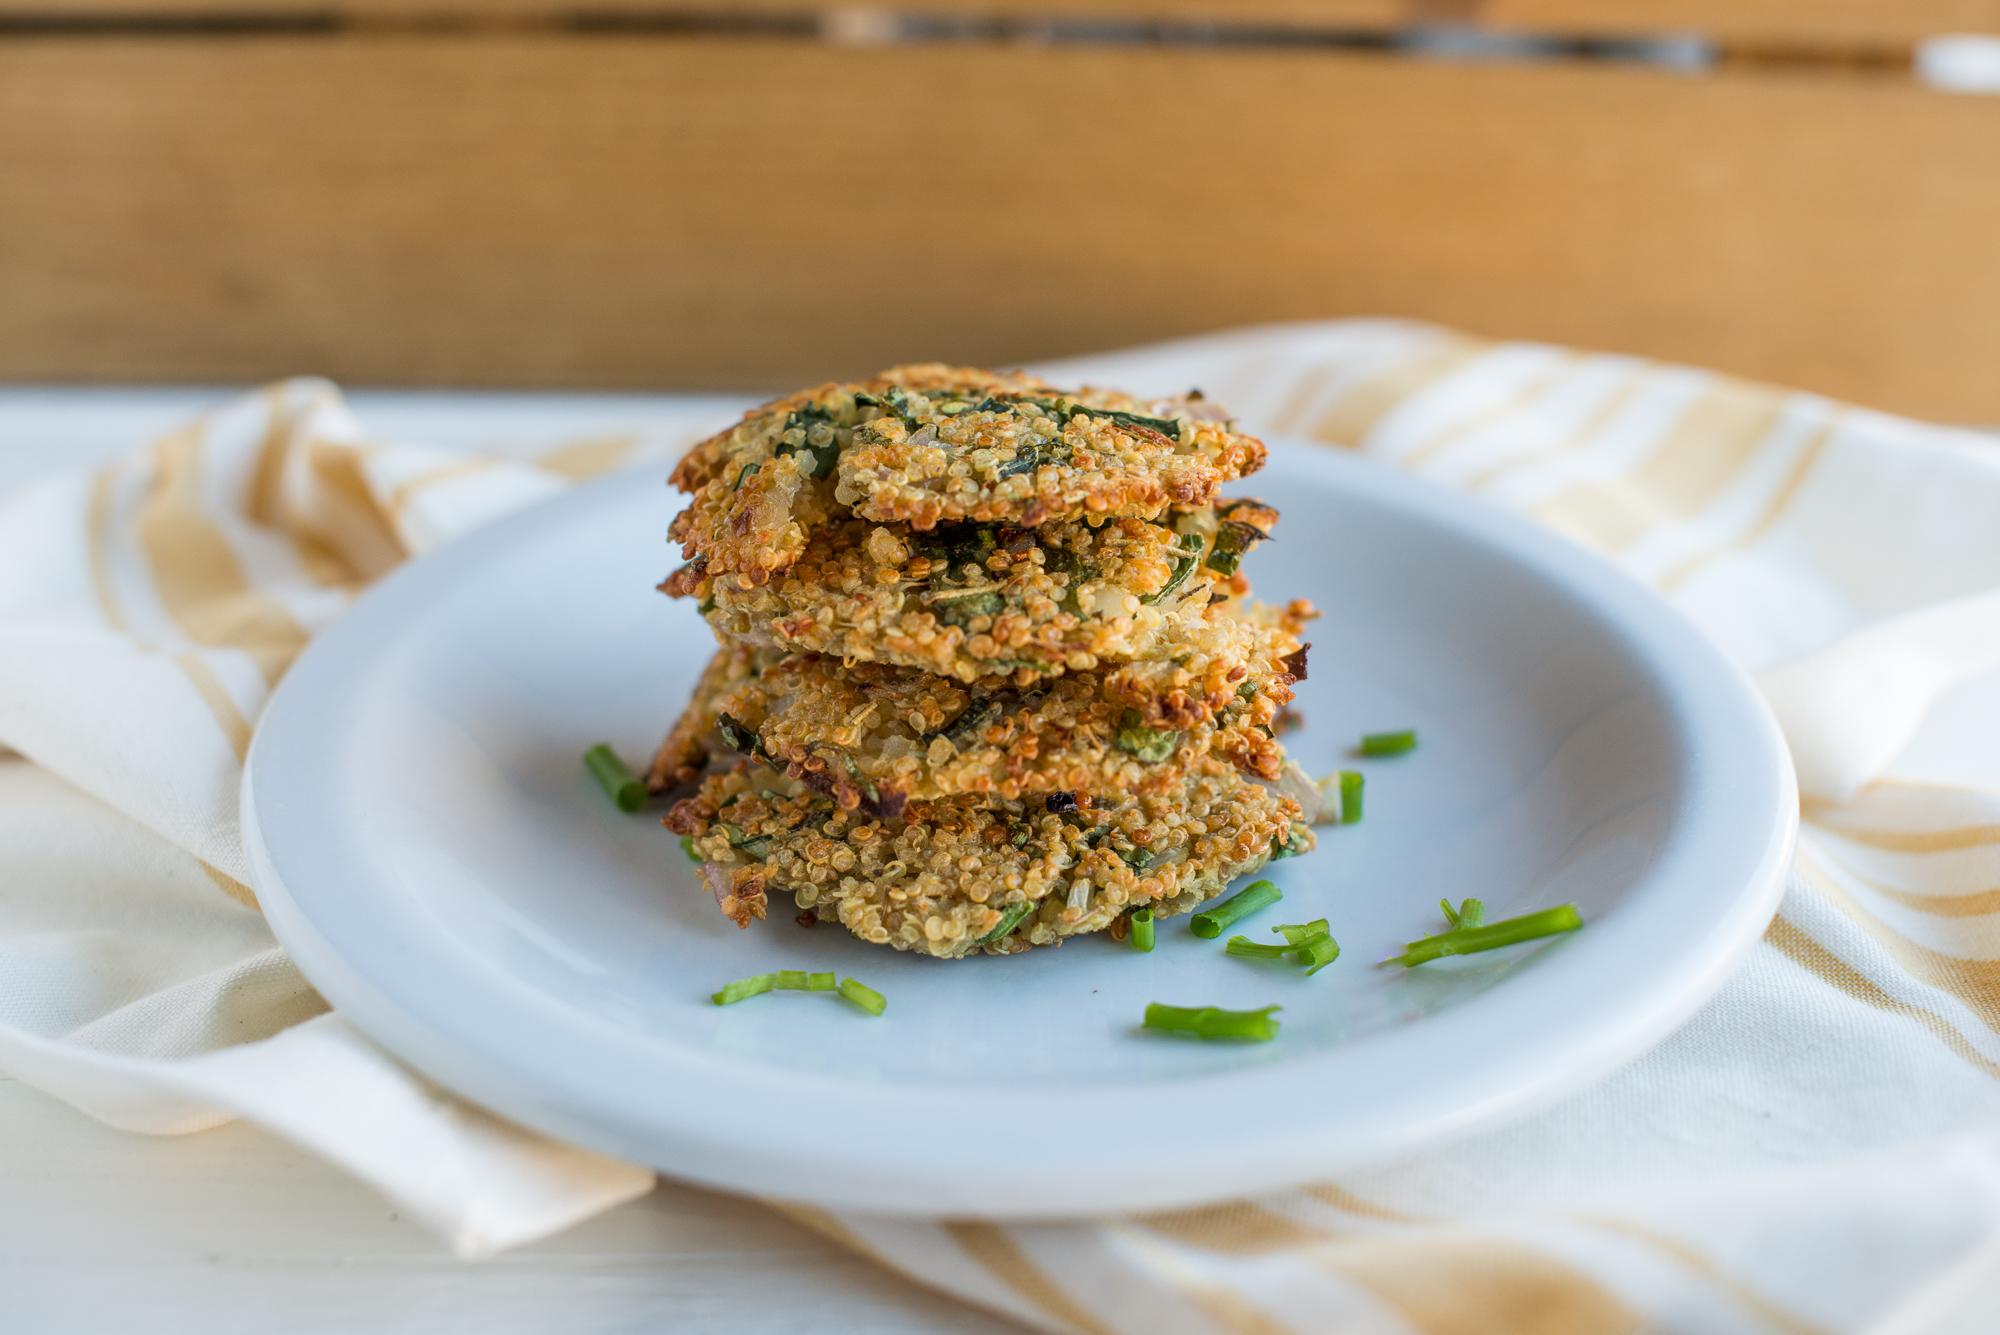 Spinach & Shallot Quinoa Burgers